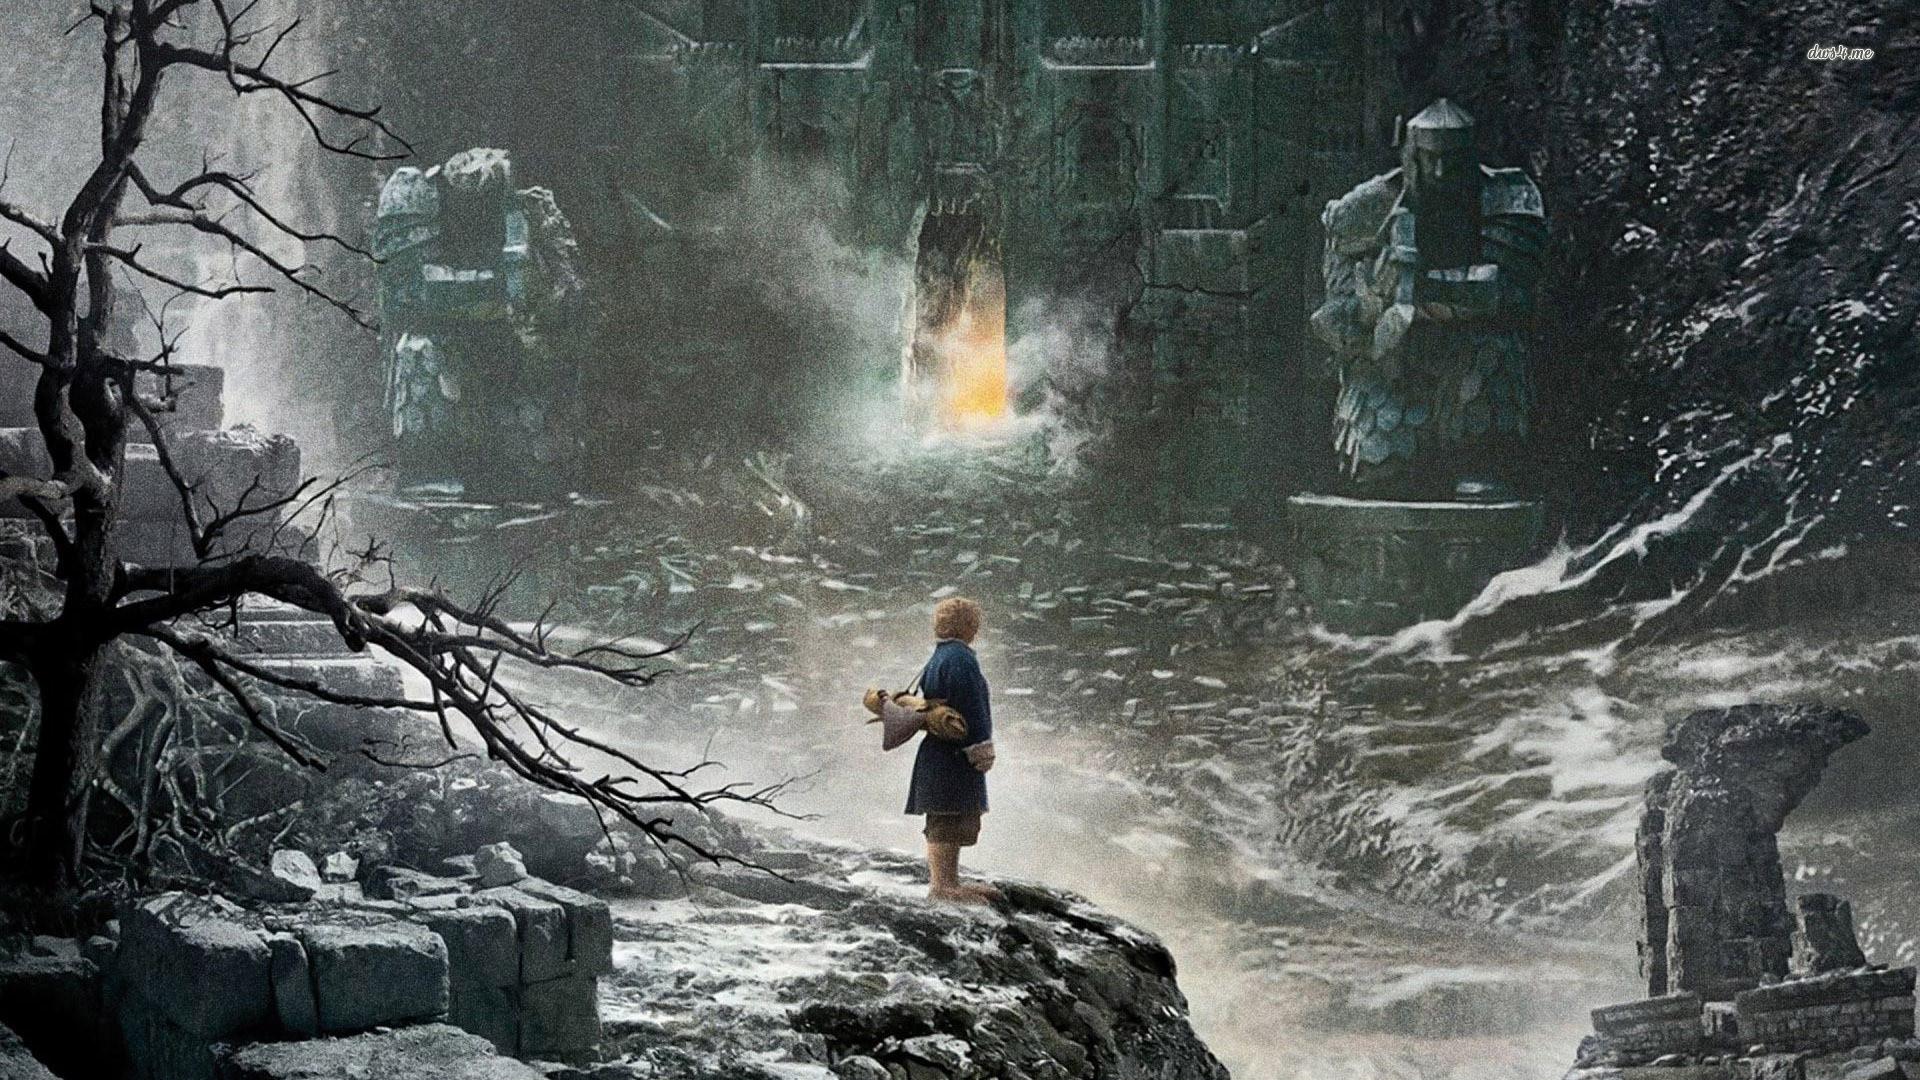 The Desolation Of Smaug Movie Wallpaper